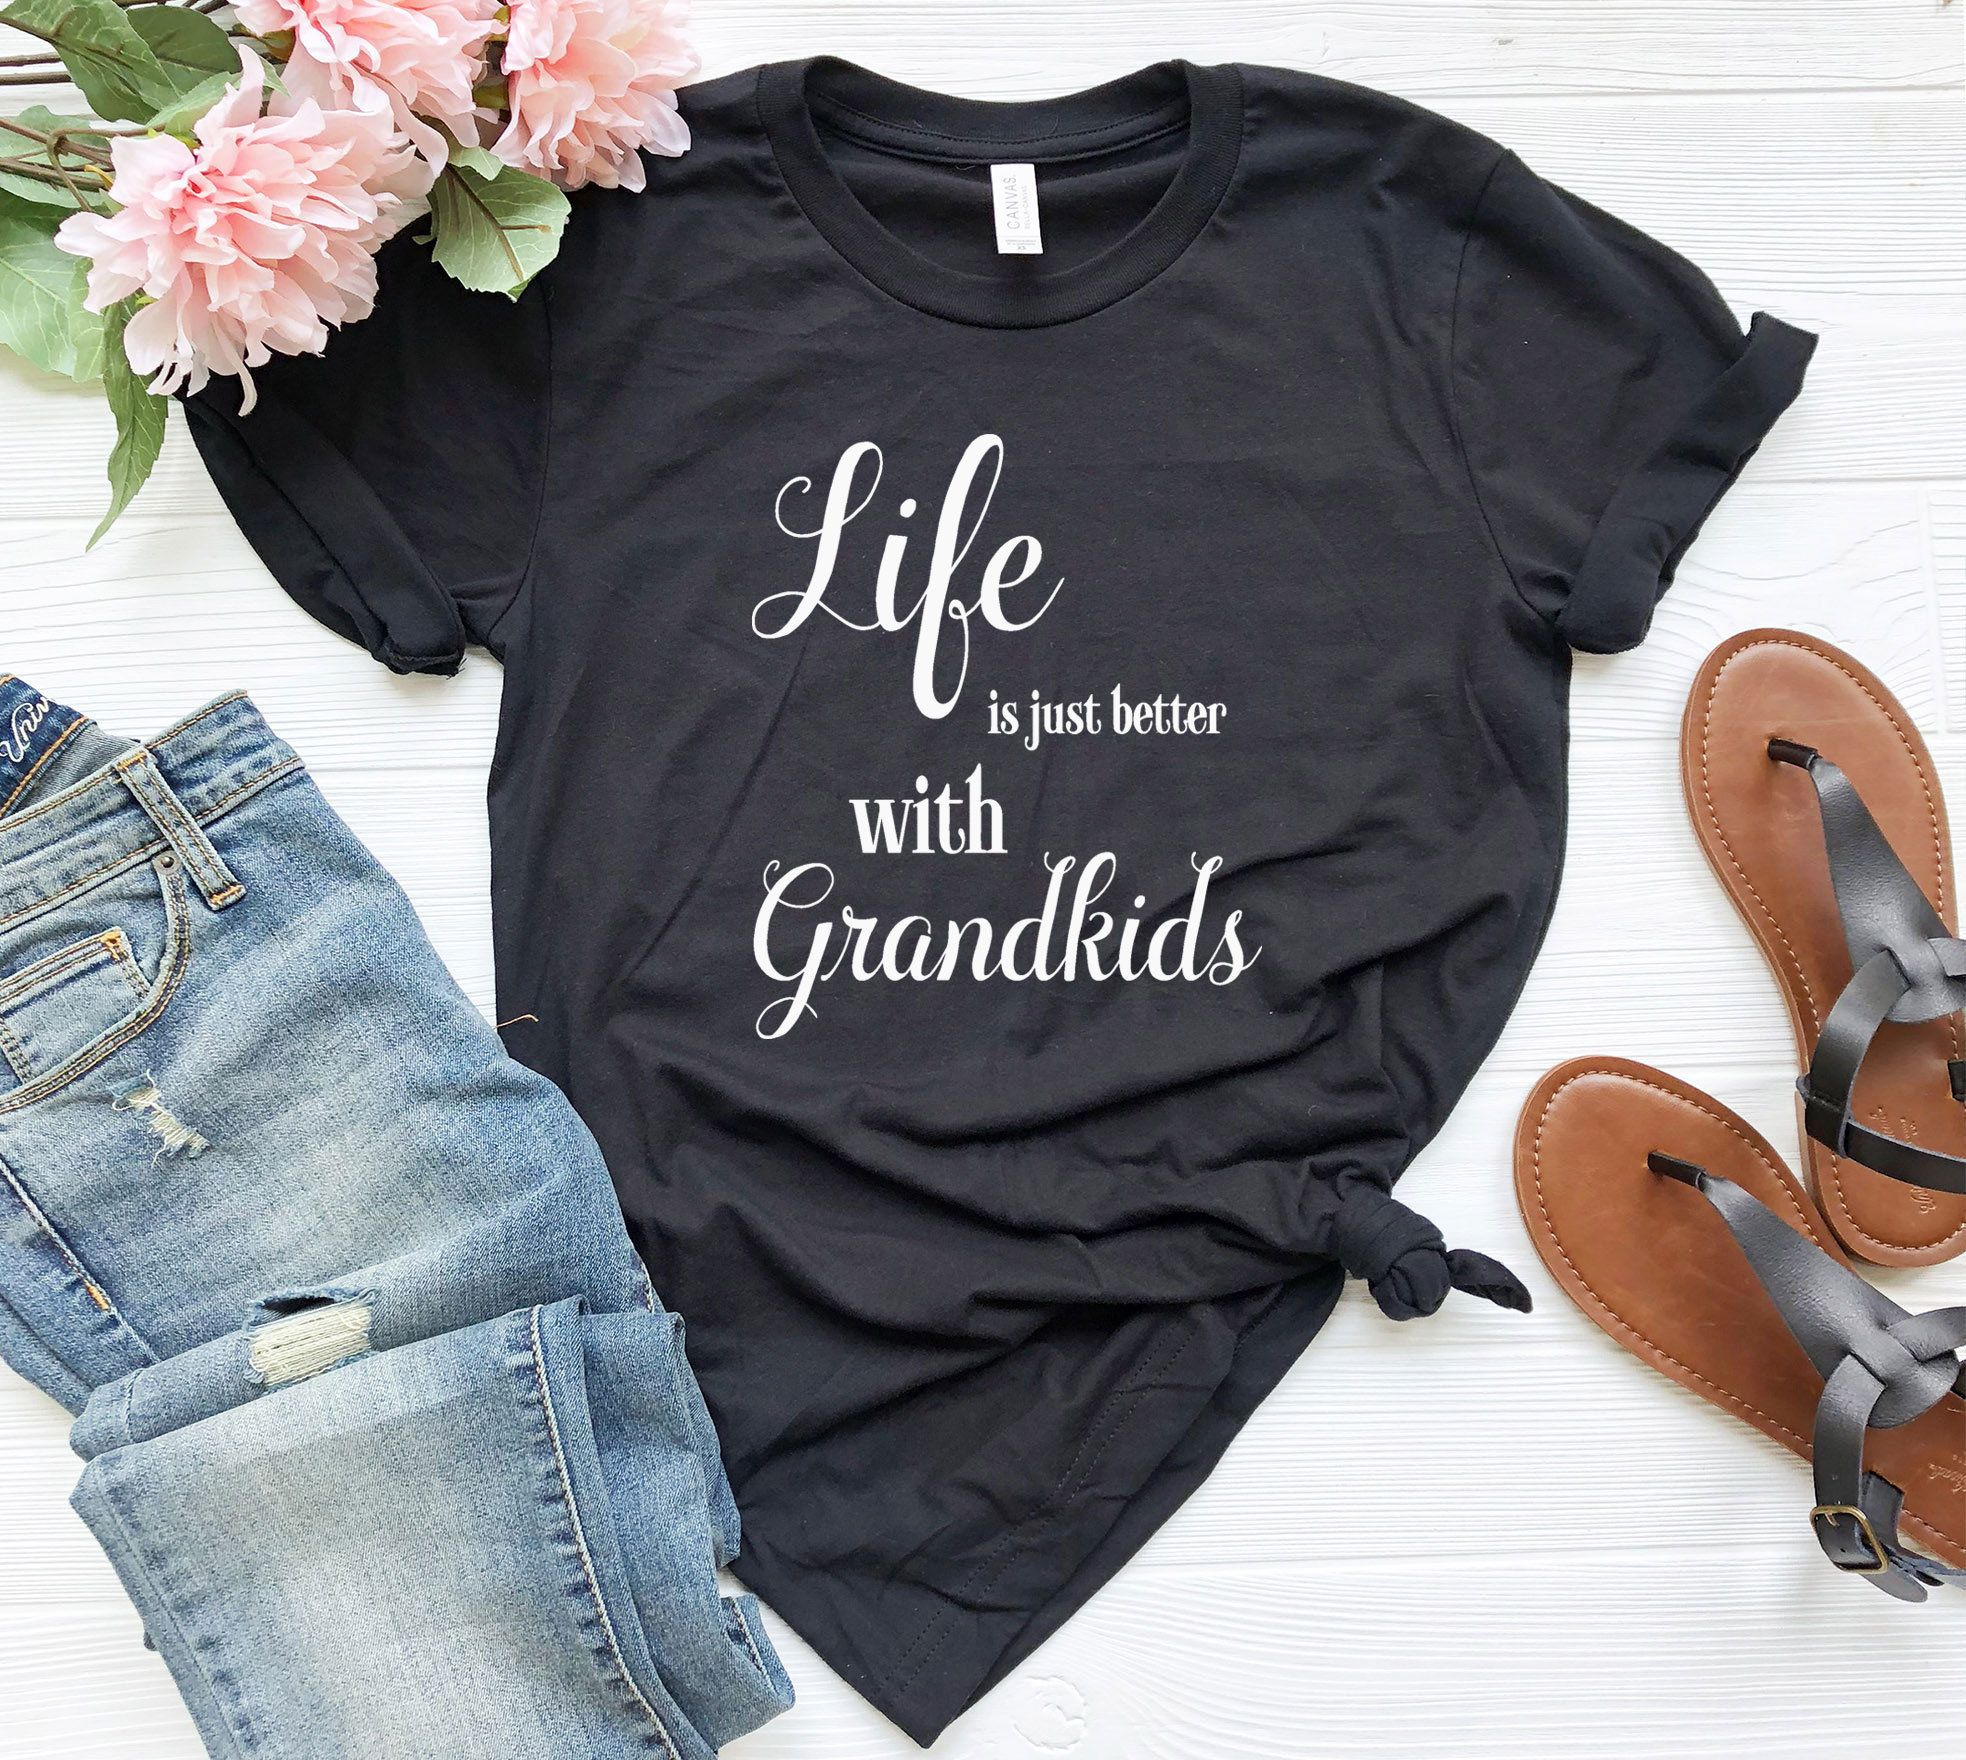 Life Is Just Better With Grandma shirt, Nana Shirt, Grandma, Grandpa Birthday Gift, Grandparents Shirt, Grandparents Shirt, Mothers Day Idea #grandpabirthdaygifts